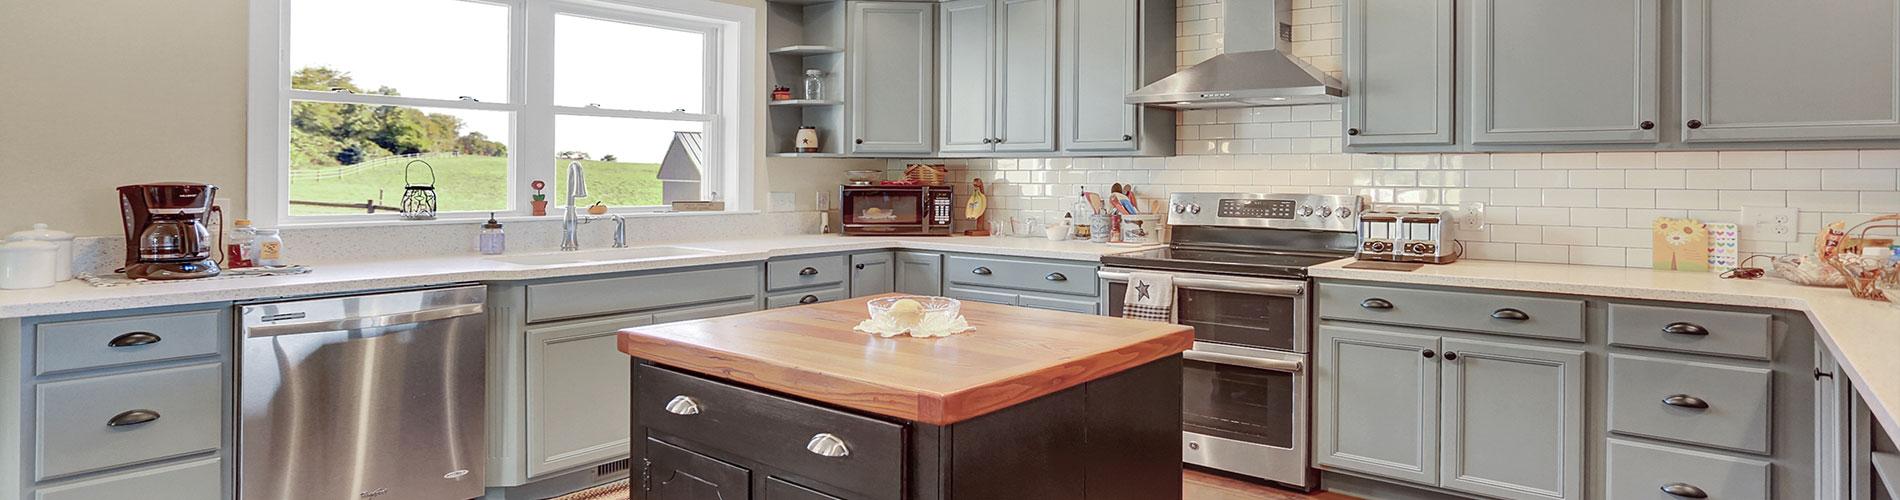 Custom Home Design Drafting Service In Pennsylvania